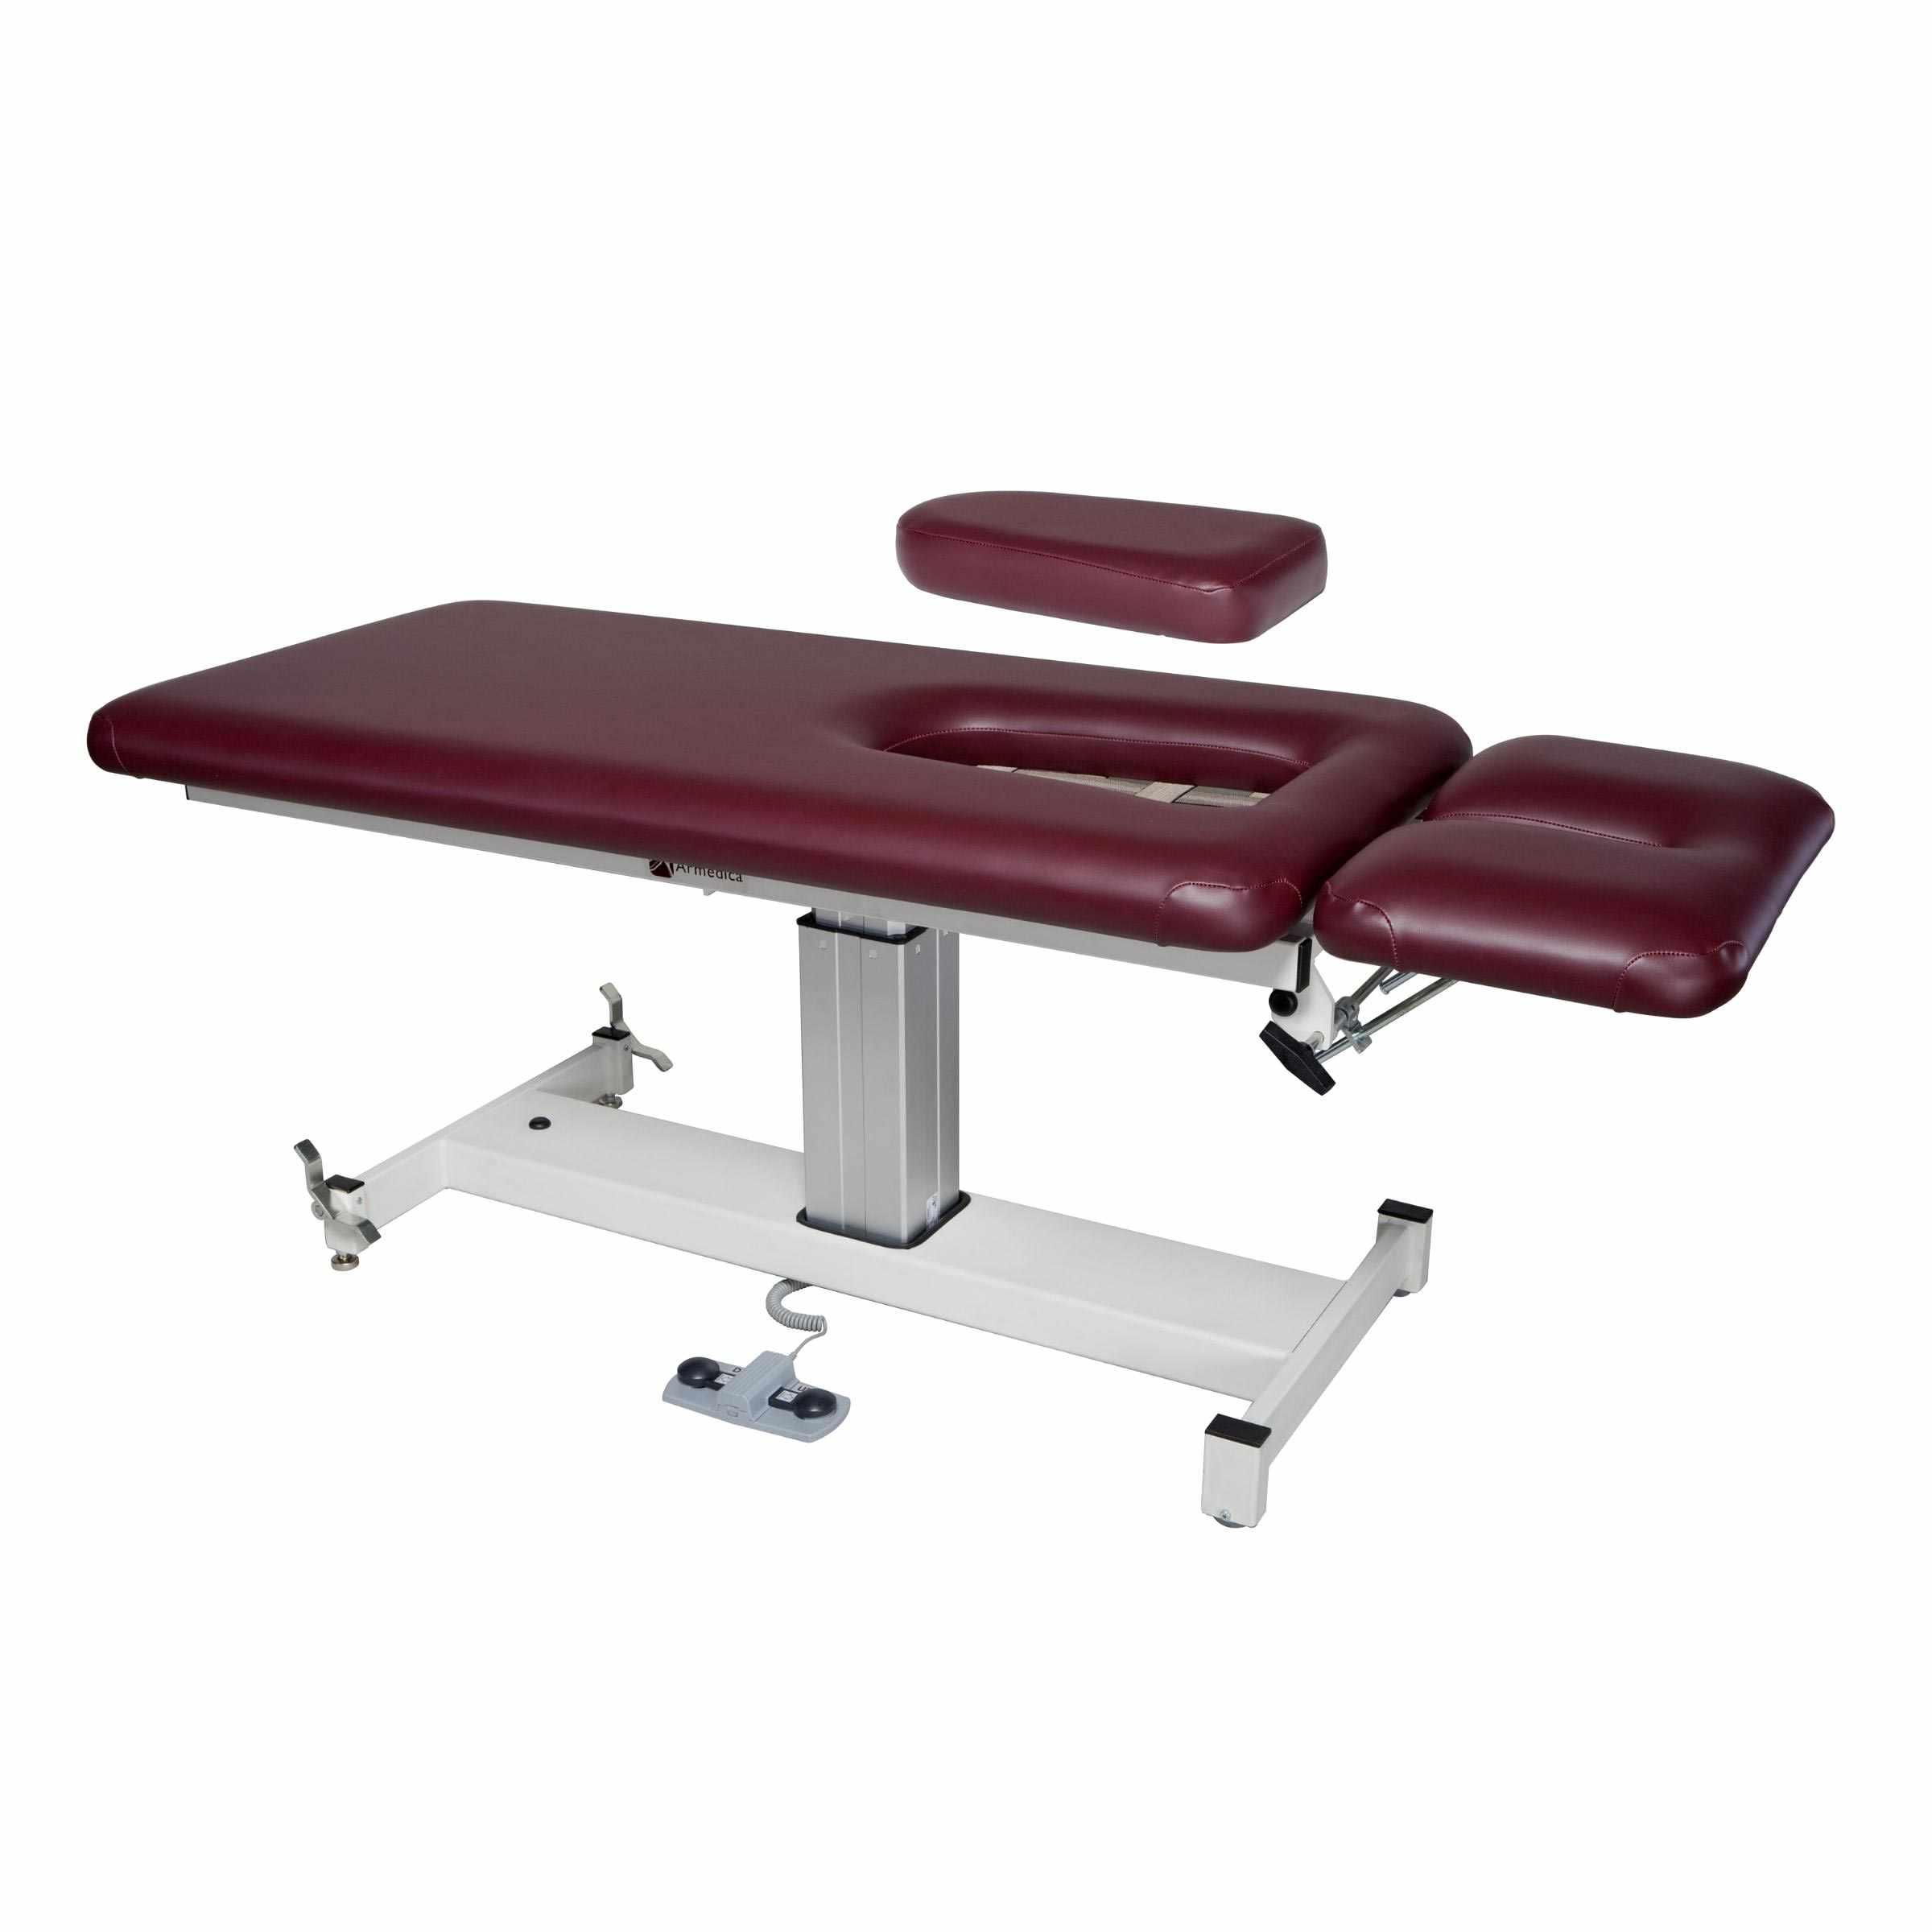 Armedica AM-SP 202 treatment table